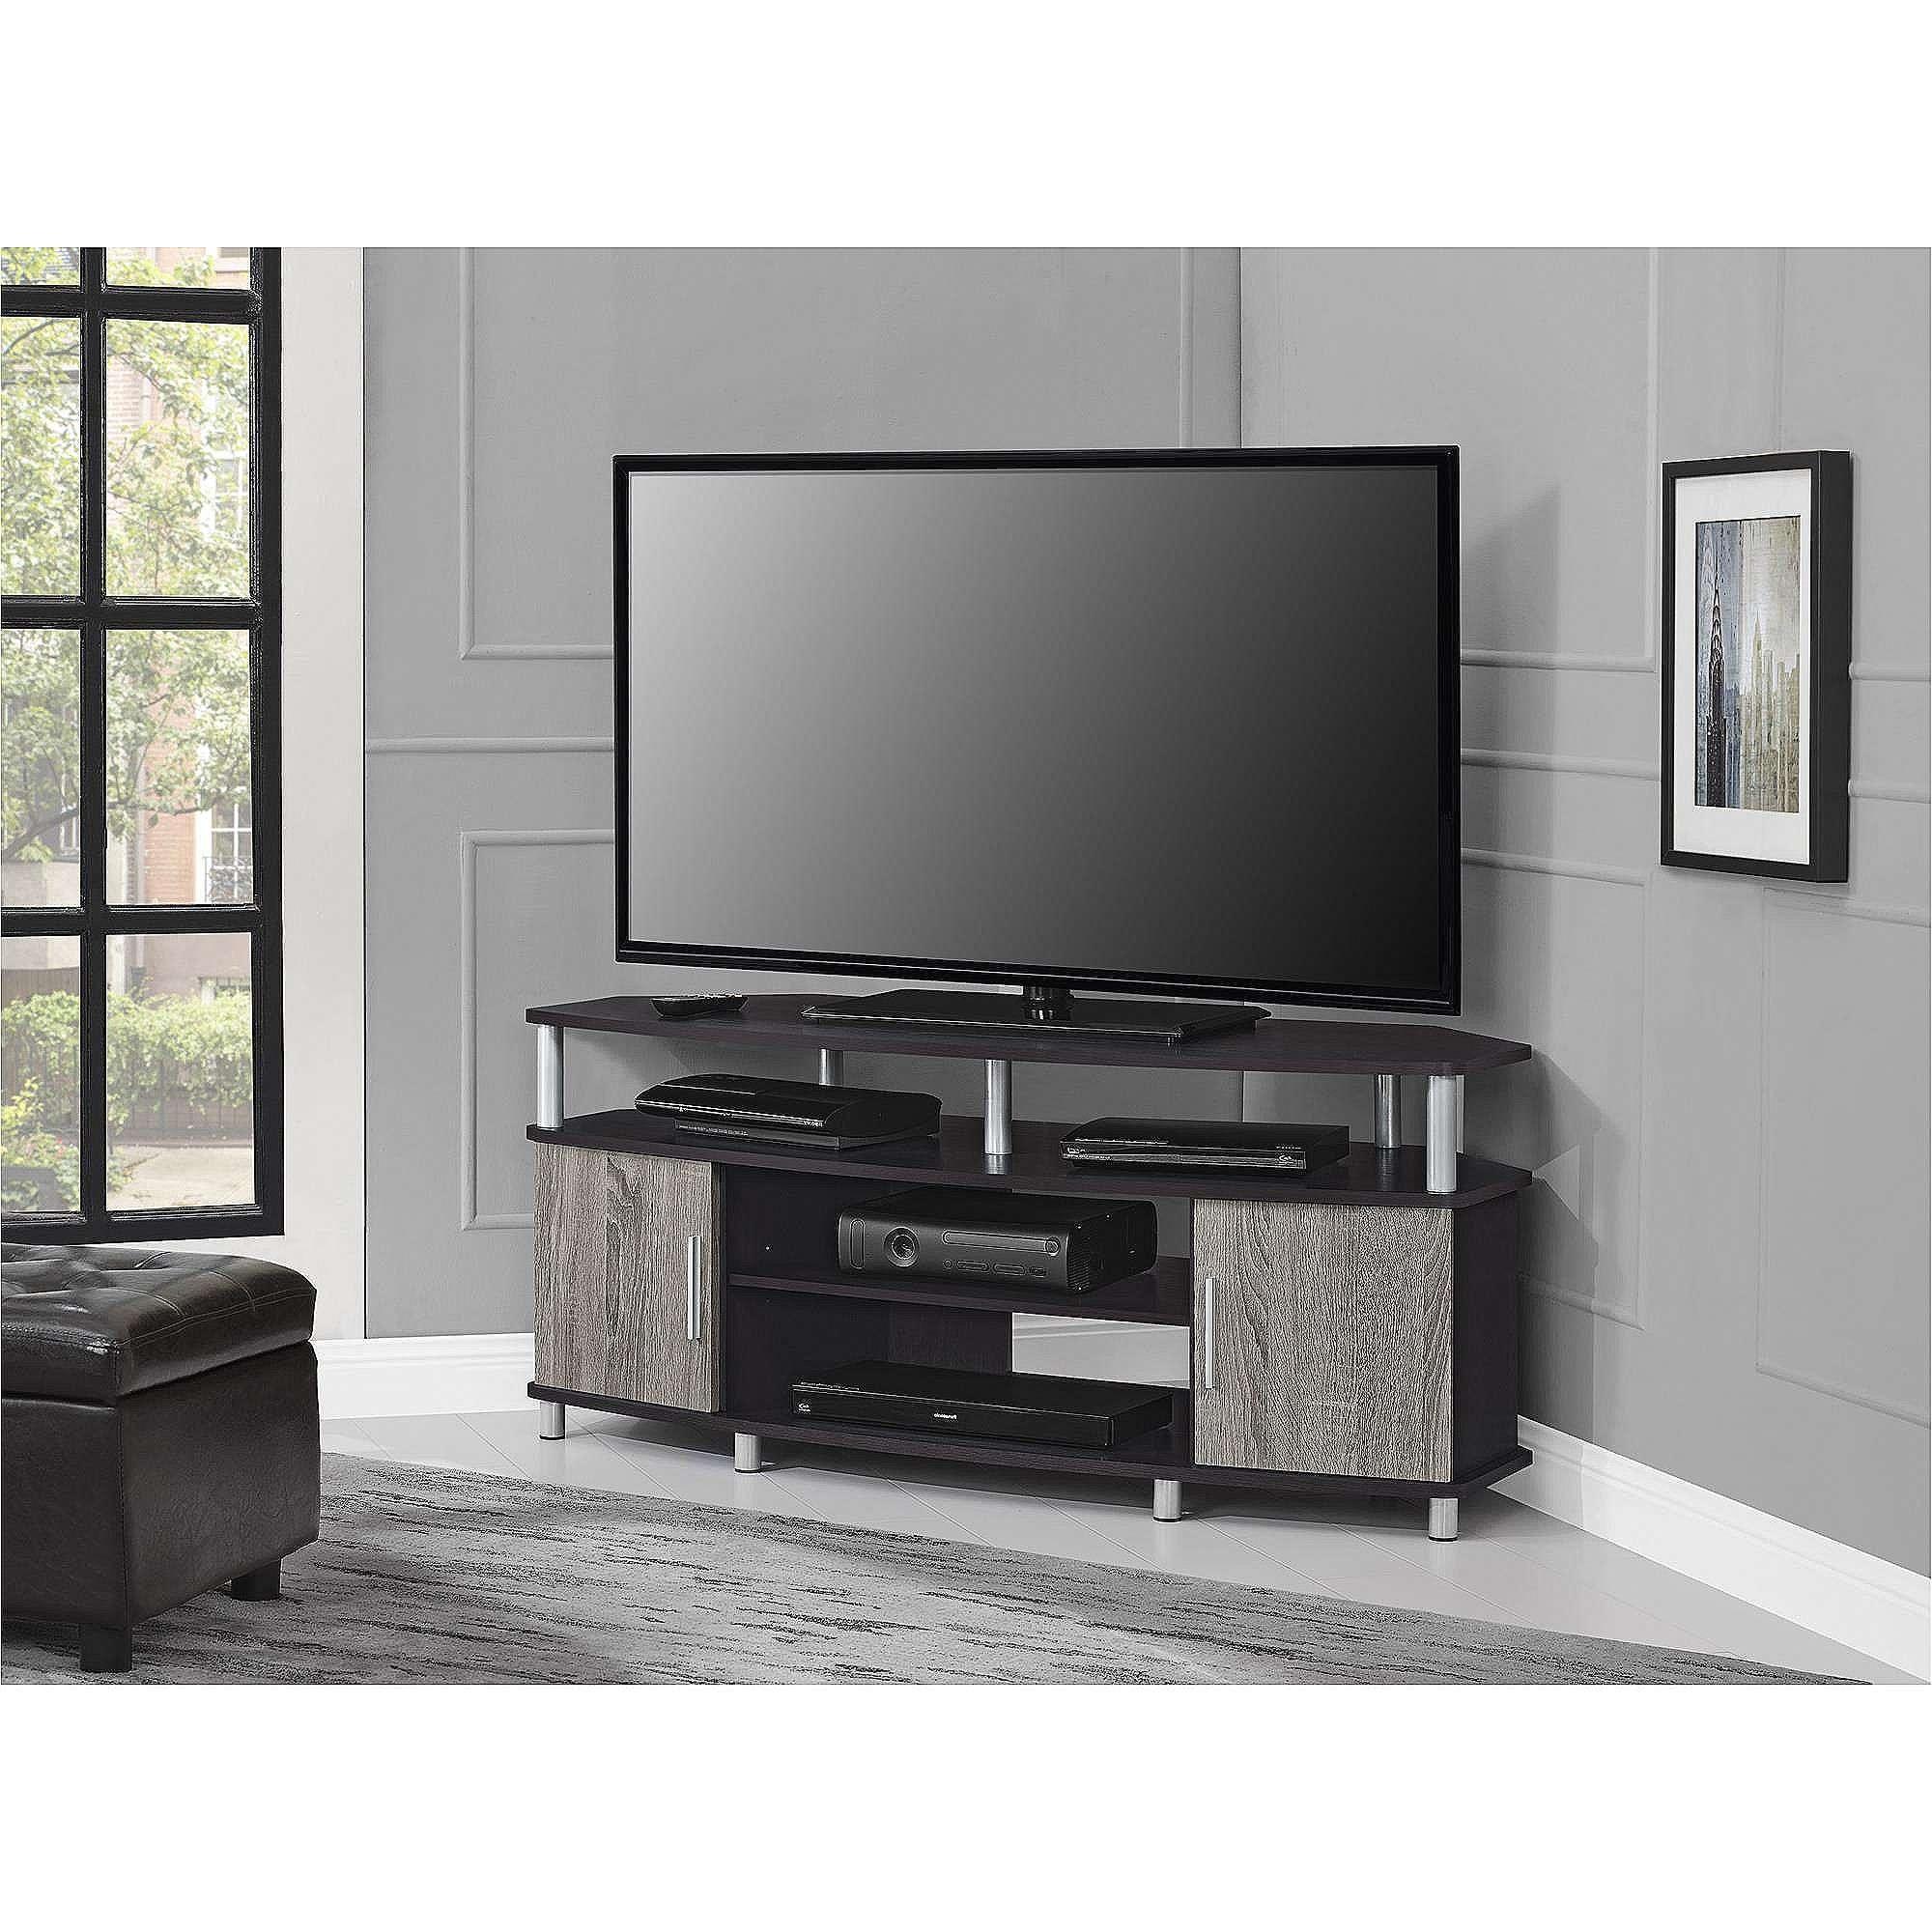 Luxury Modern Corner Tv Stand (36 Photos) | Bathgroundspath Within Luxury Tv Stands (View 12 of 15)